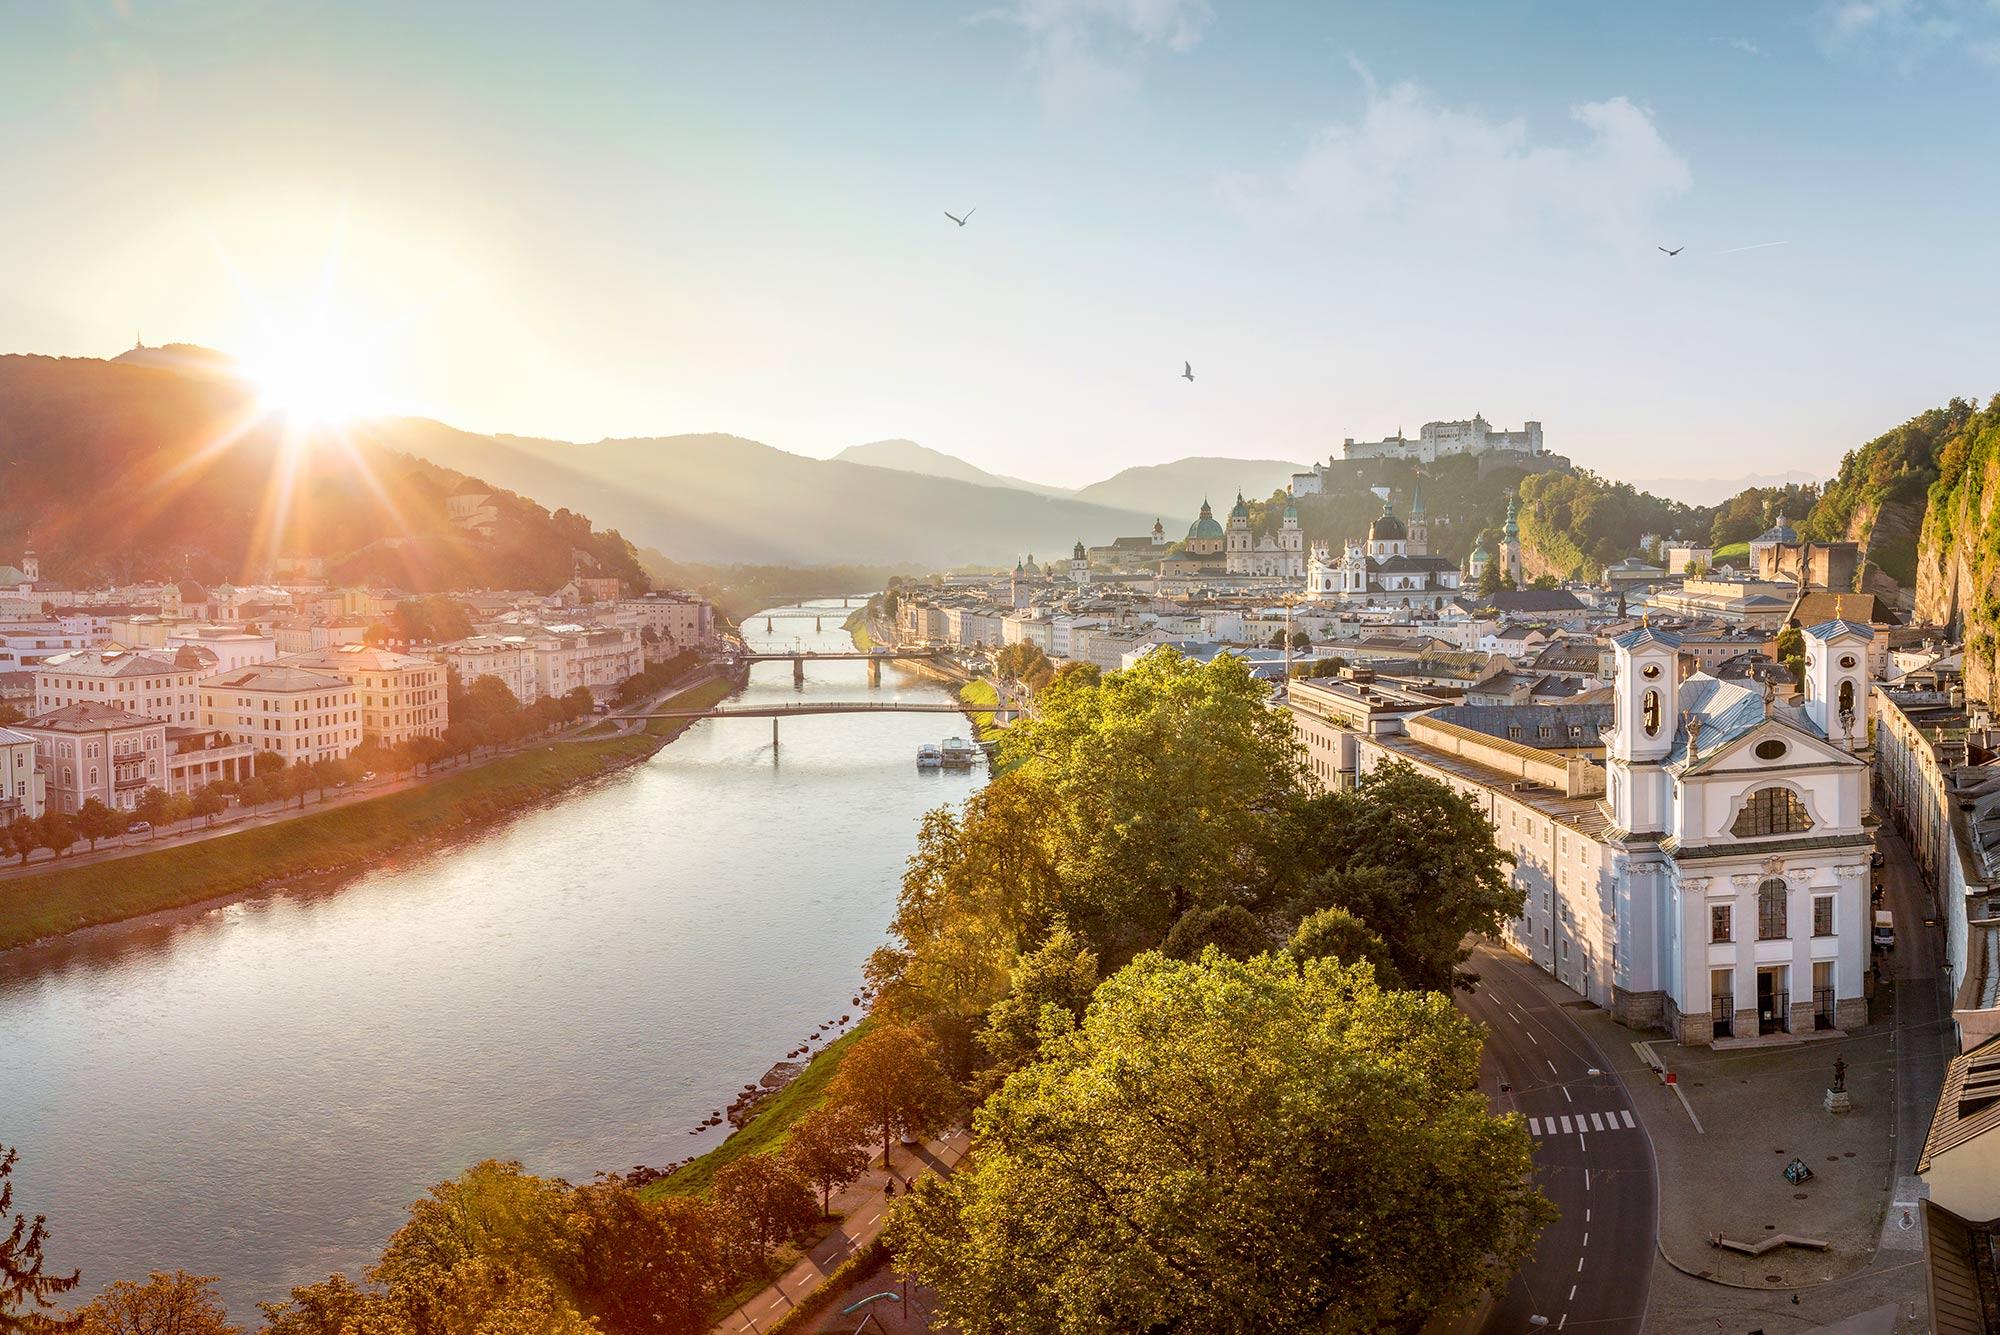 Sunrise over the beautiful city of Salzburg.